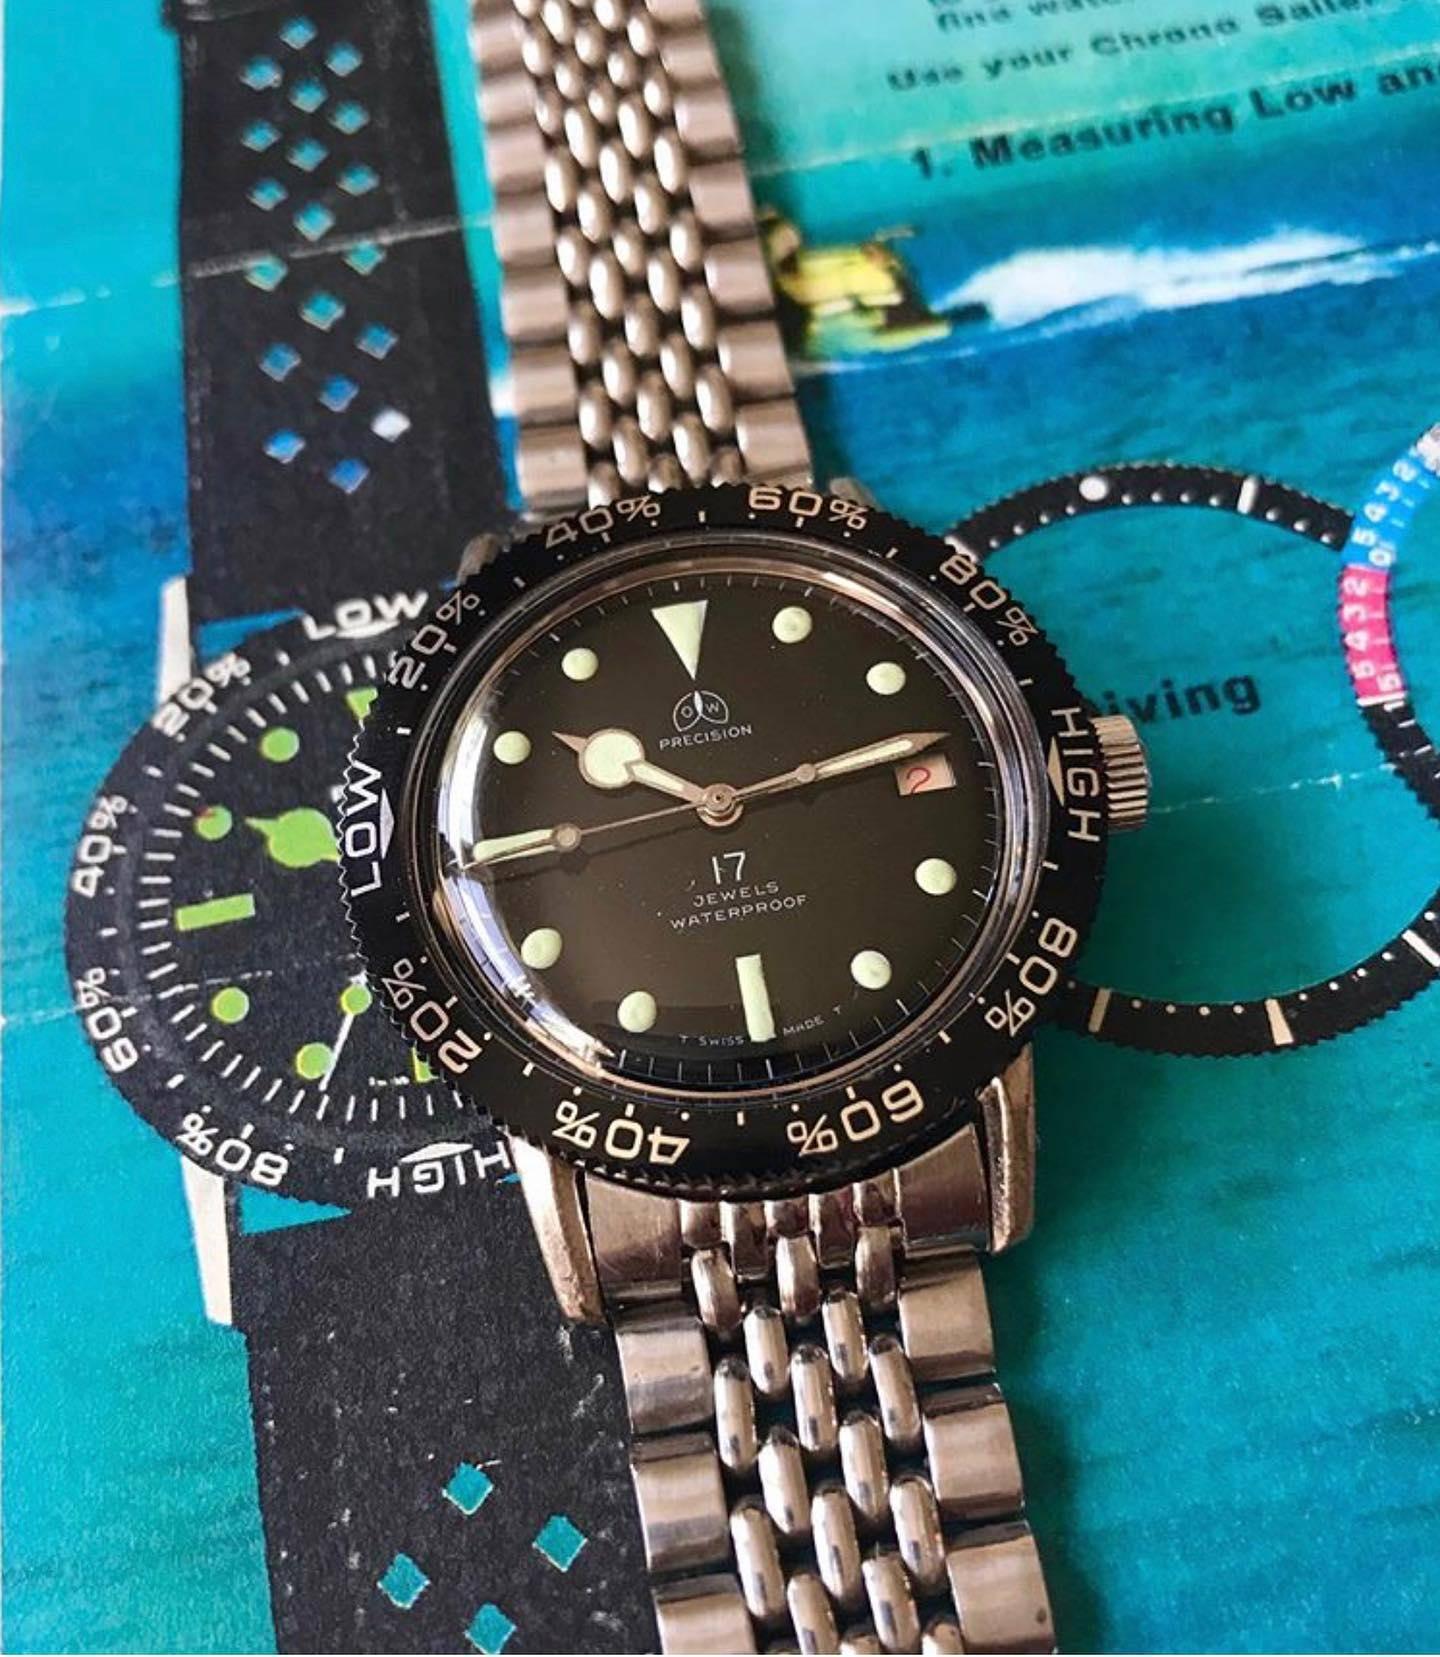 @bristnj_jeff with rare a tidal bezel OW precision diver